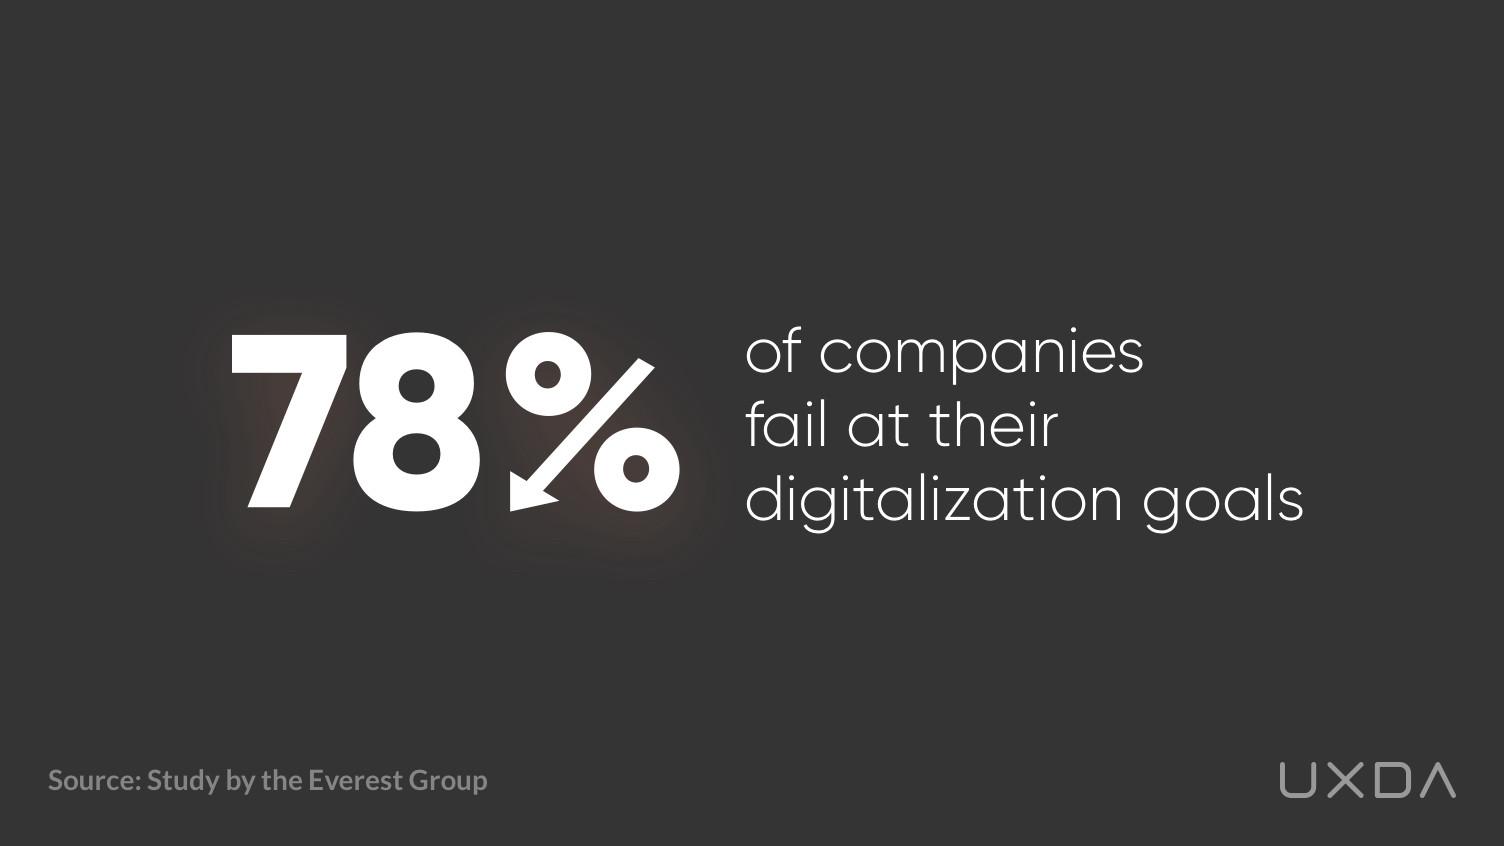 digital-transformation-in-banking-uxda-73-percent-fail-newest__1504.jpg